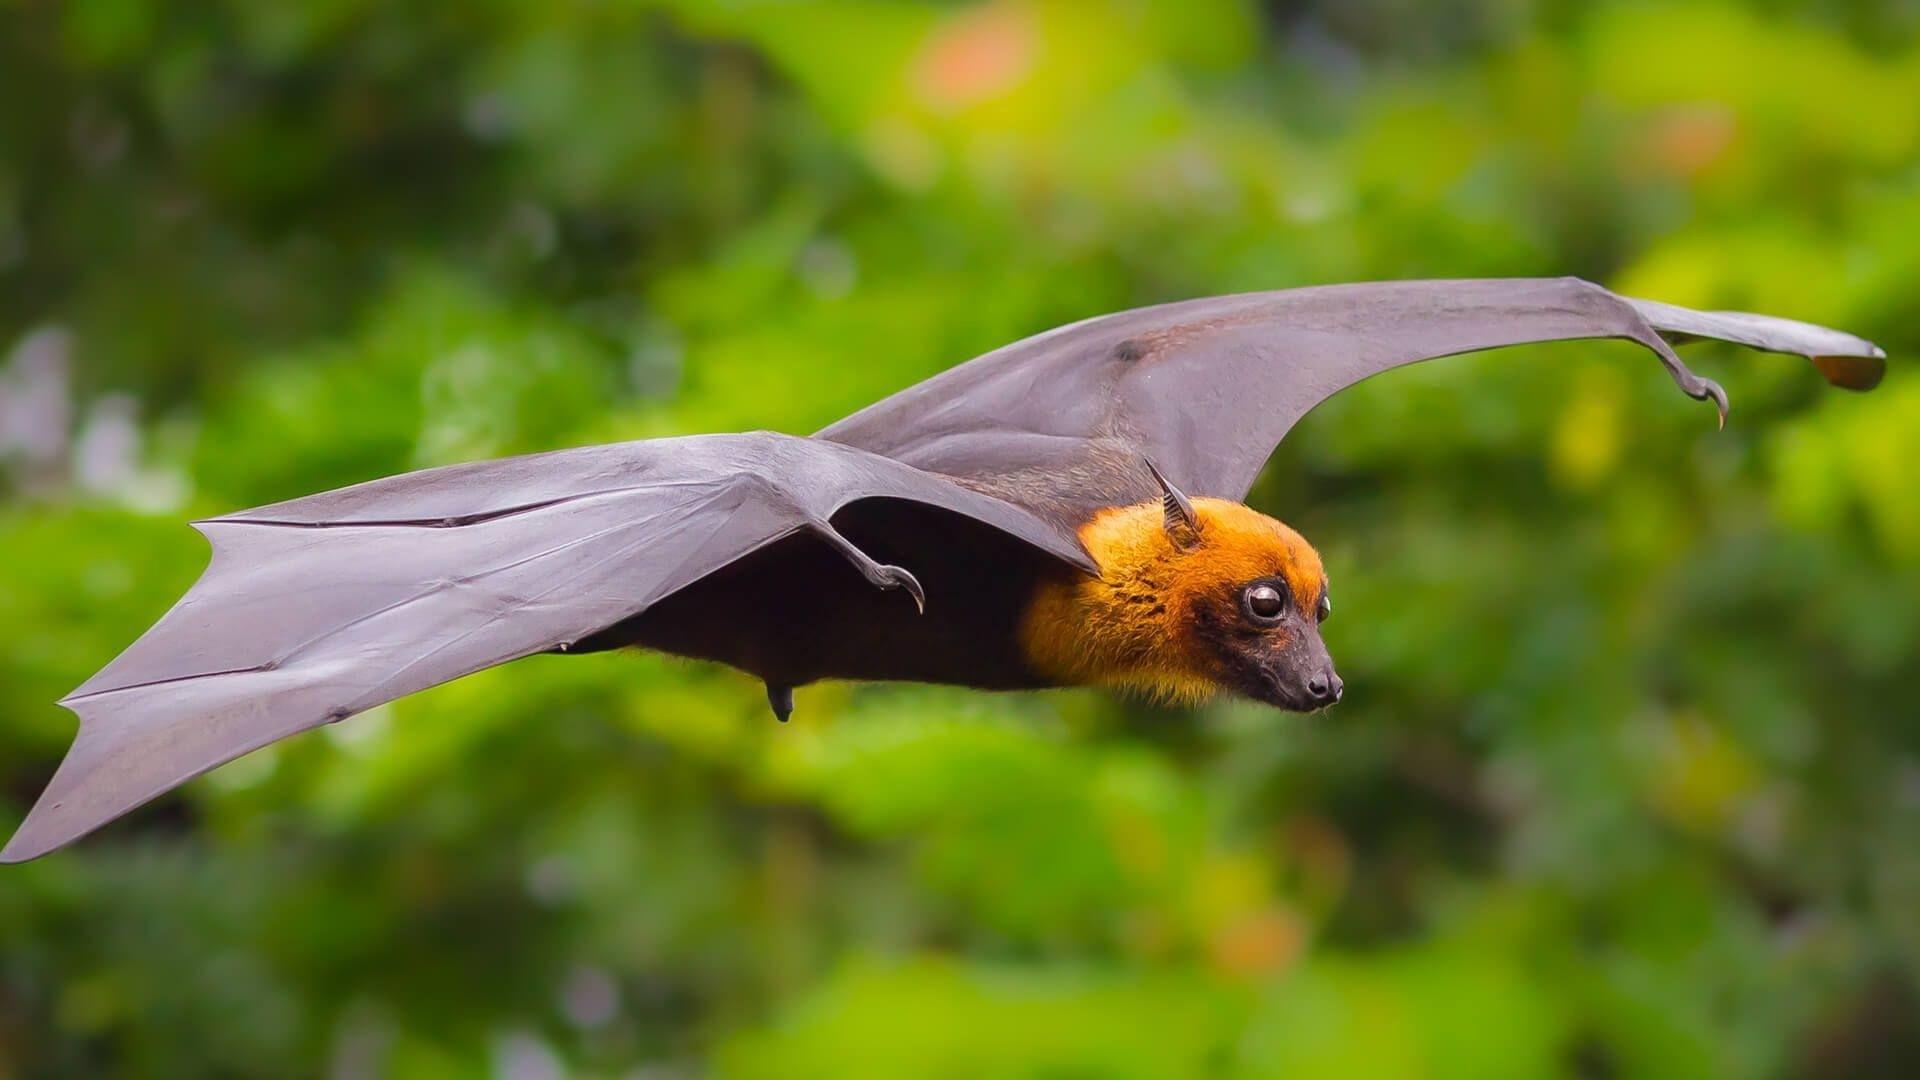 Bat Wallpaper Picture hd